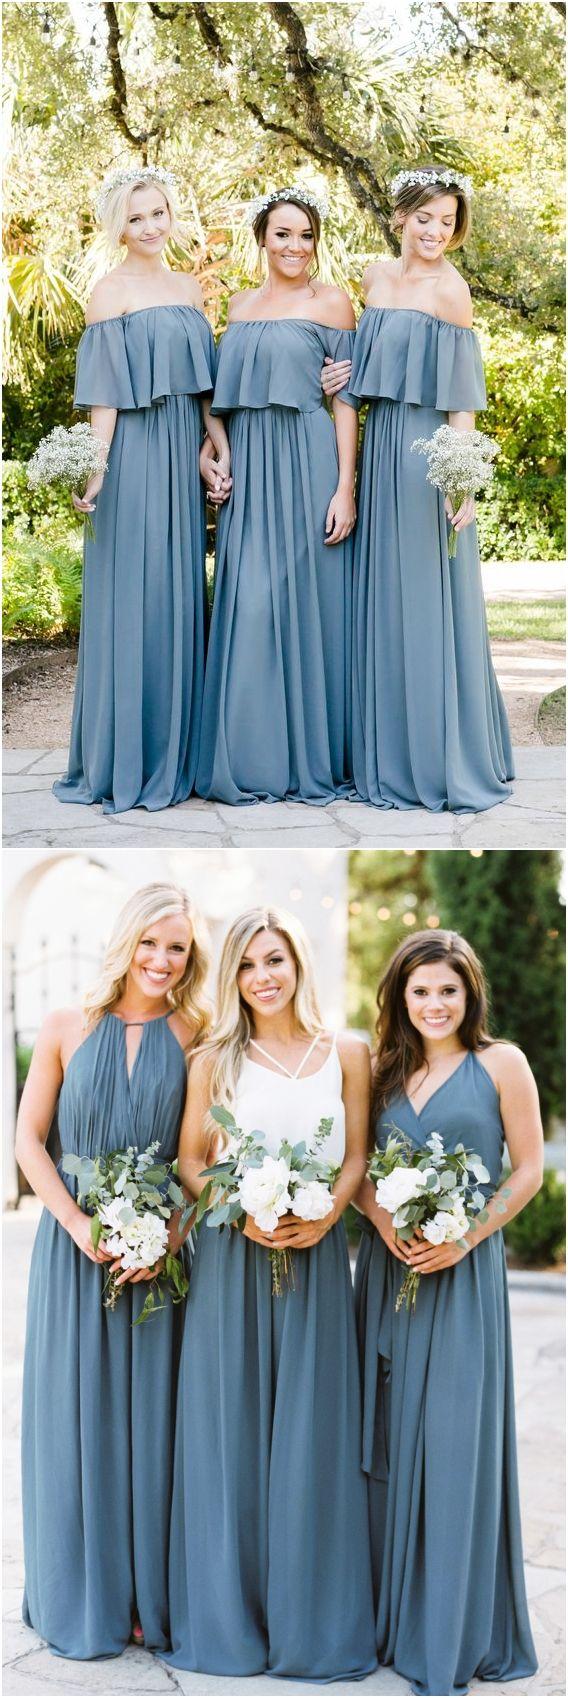 best Wedding colors images on Pinterest  Wedding ideas Wedding